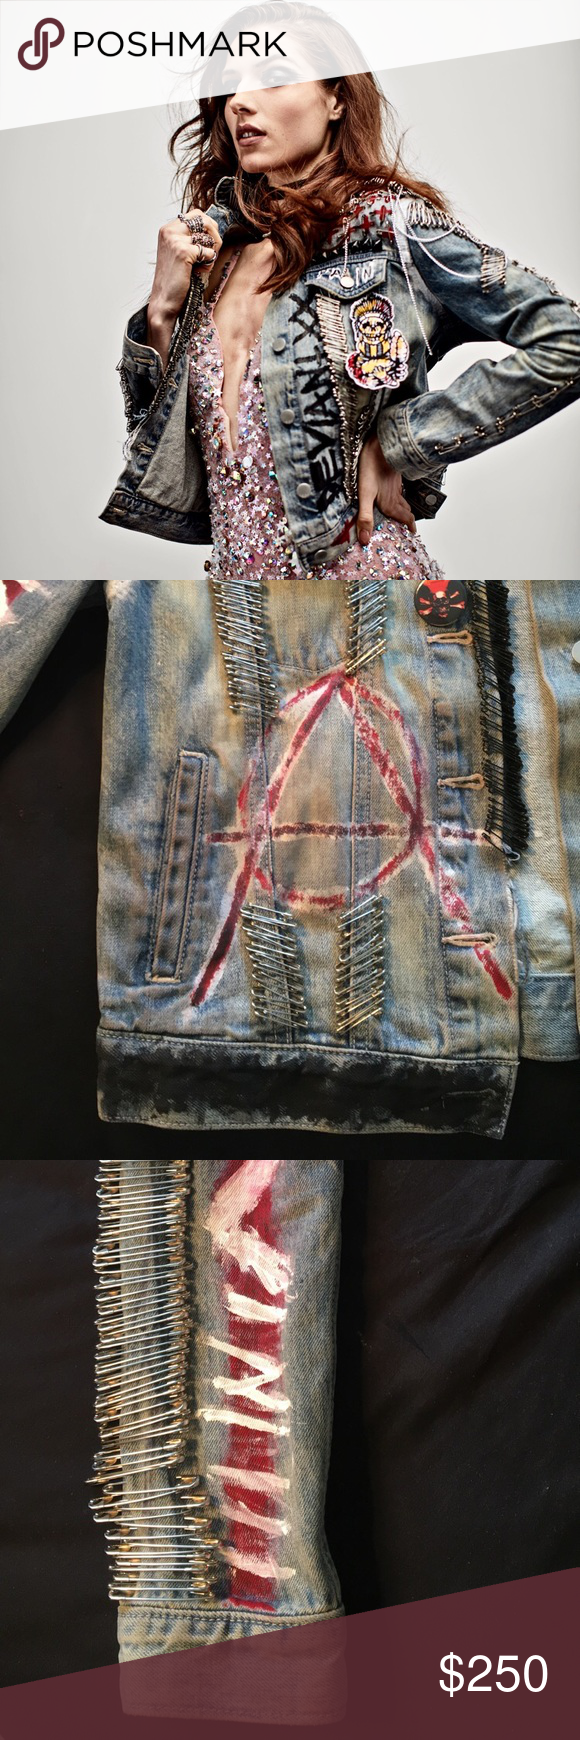 Handcrafted Punk Safety Pin Denim Jacket Black safety